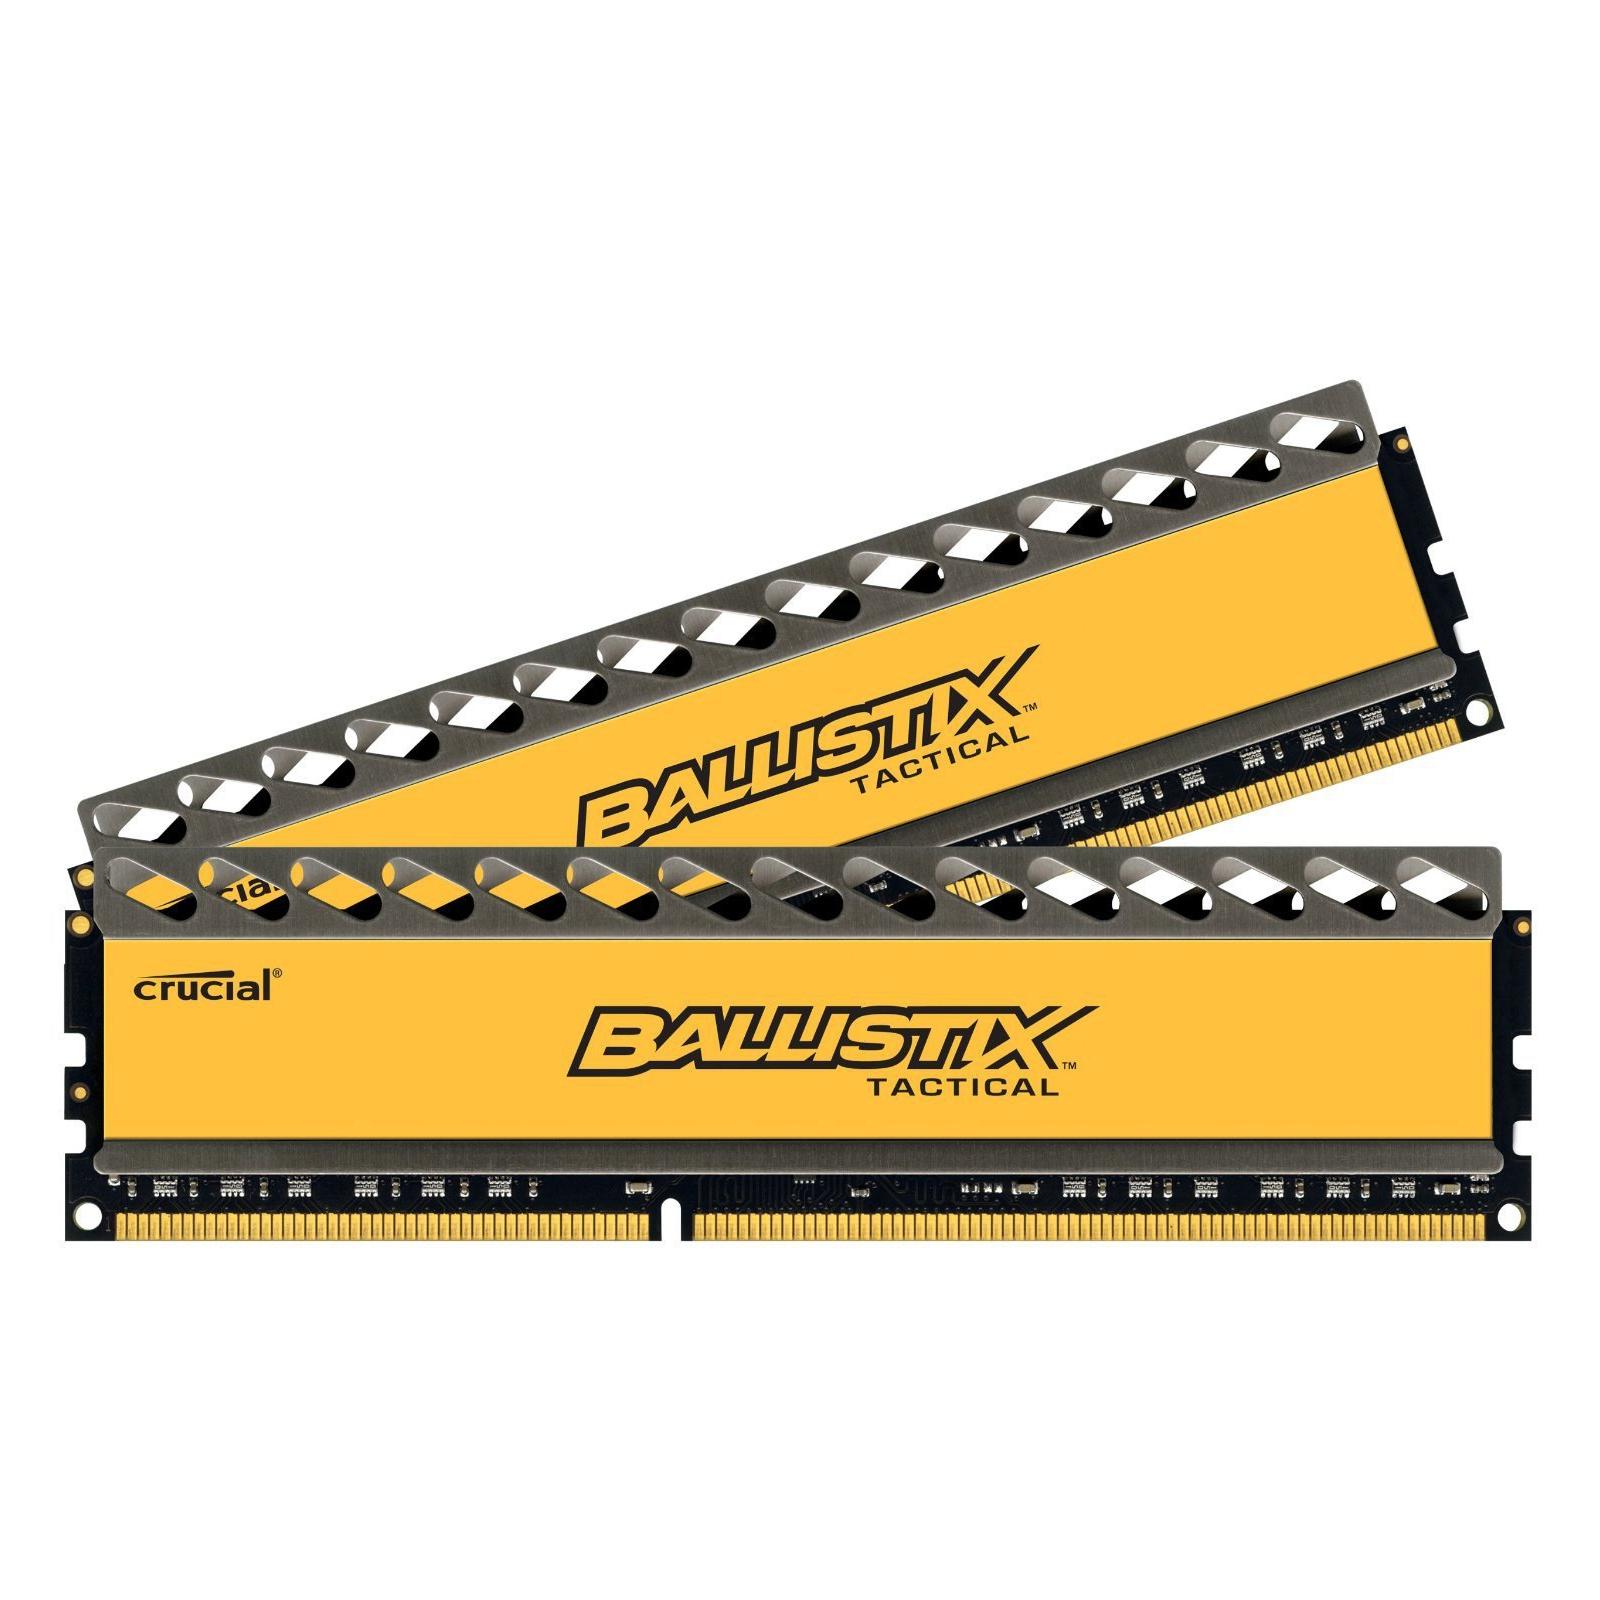 Модуль памяти для компьютера DDR3 8GB (2x4GB) 1600 MHz BallistiX Tactical MICRON (BLT2CP4G3D1608DT1TX0CEU) изображение 2